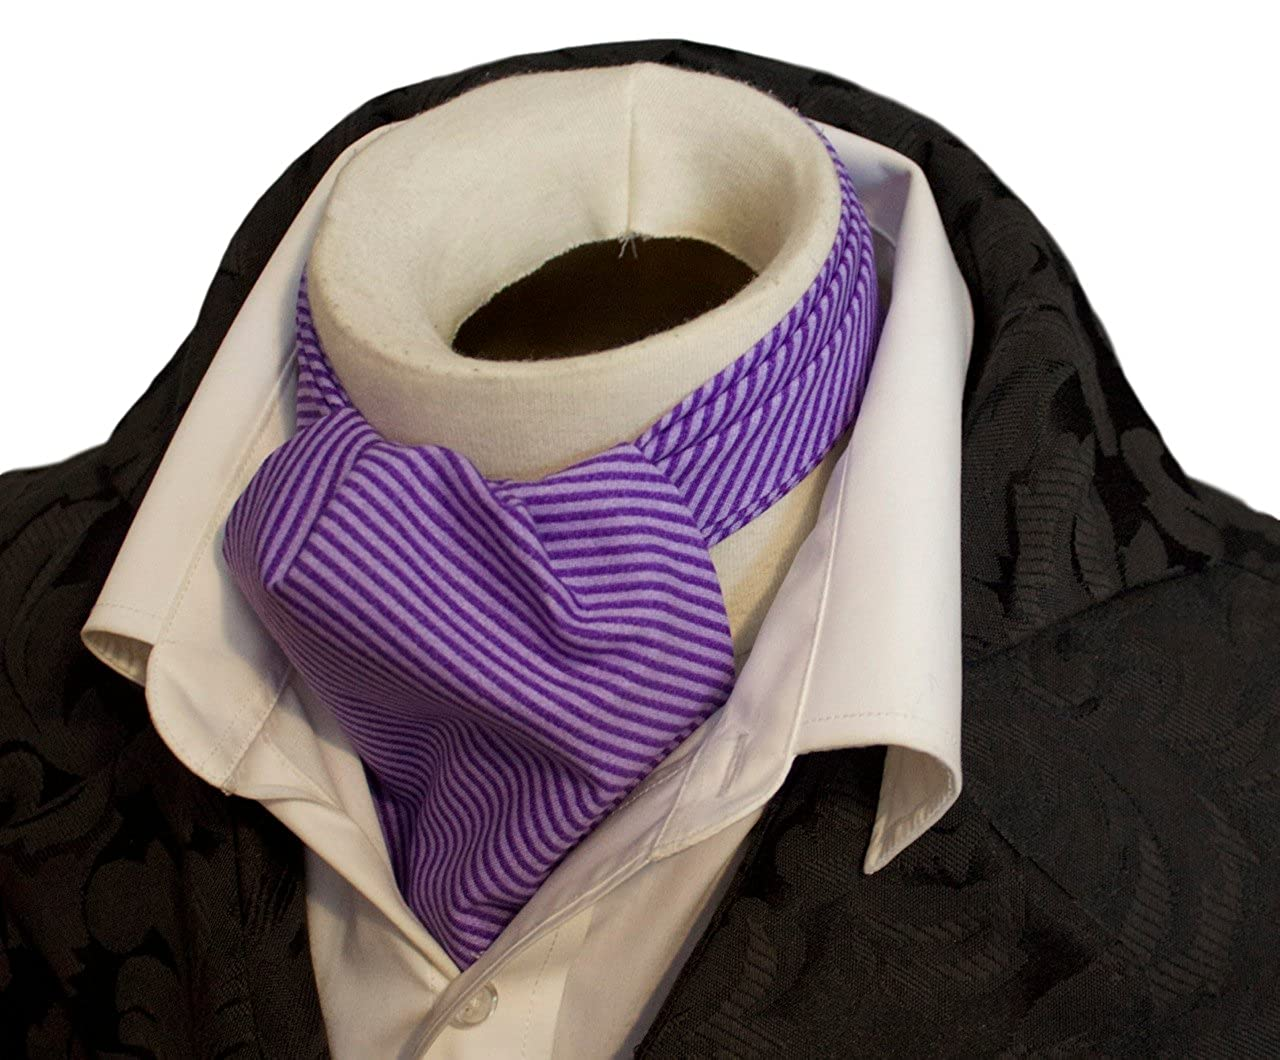 Elegantascot Handmade Pure Cotton Cravat Ascot Tie - Striped Patterns DC_Cotton_NavyTealStripe